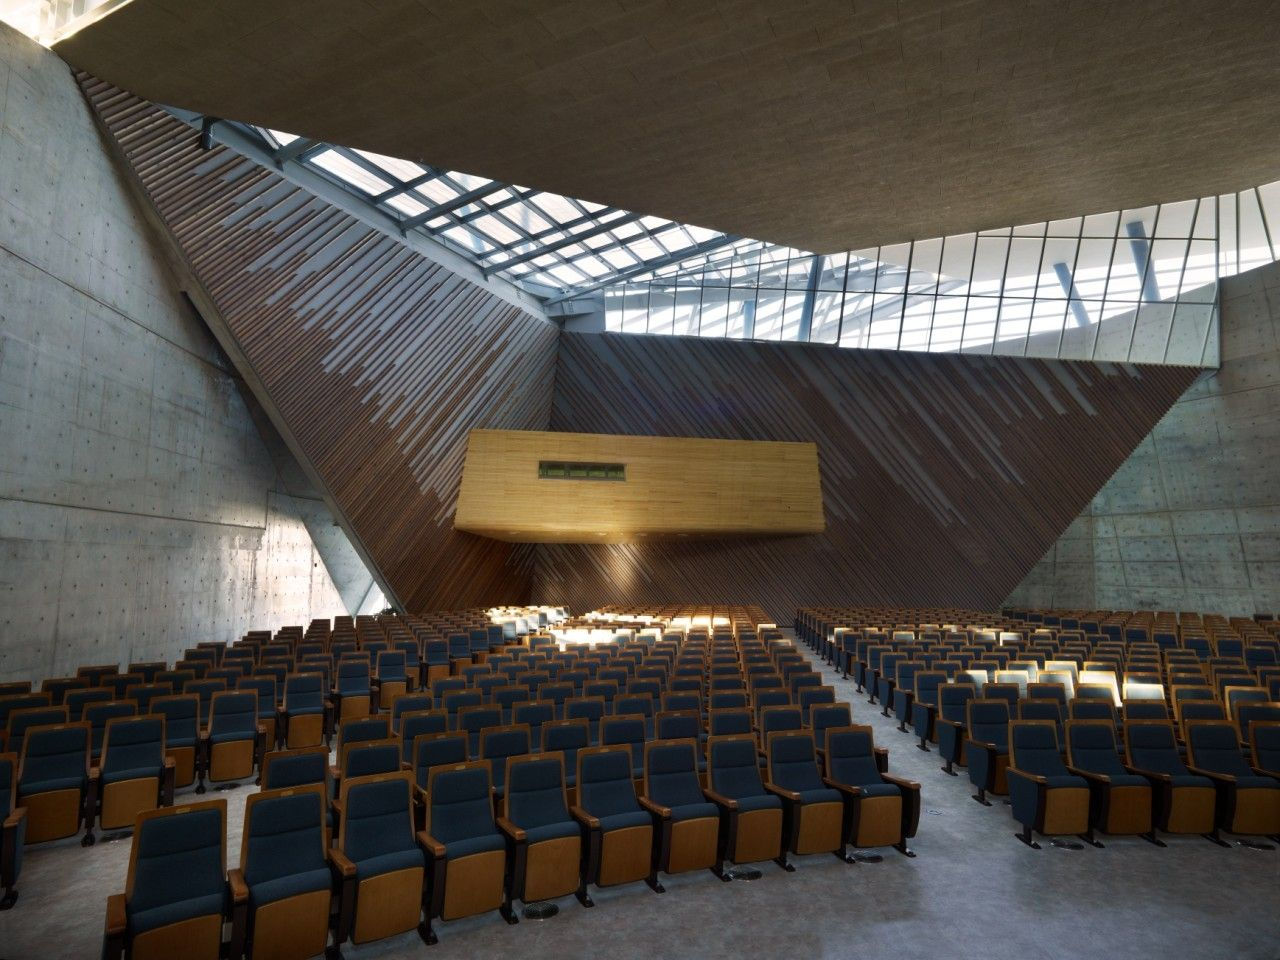 Paichai University Appenzeller Memorial Hall